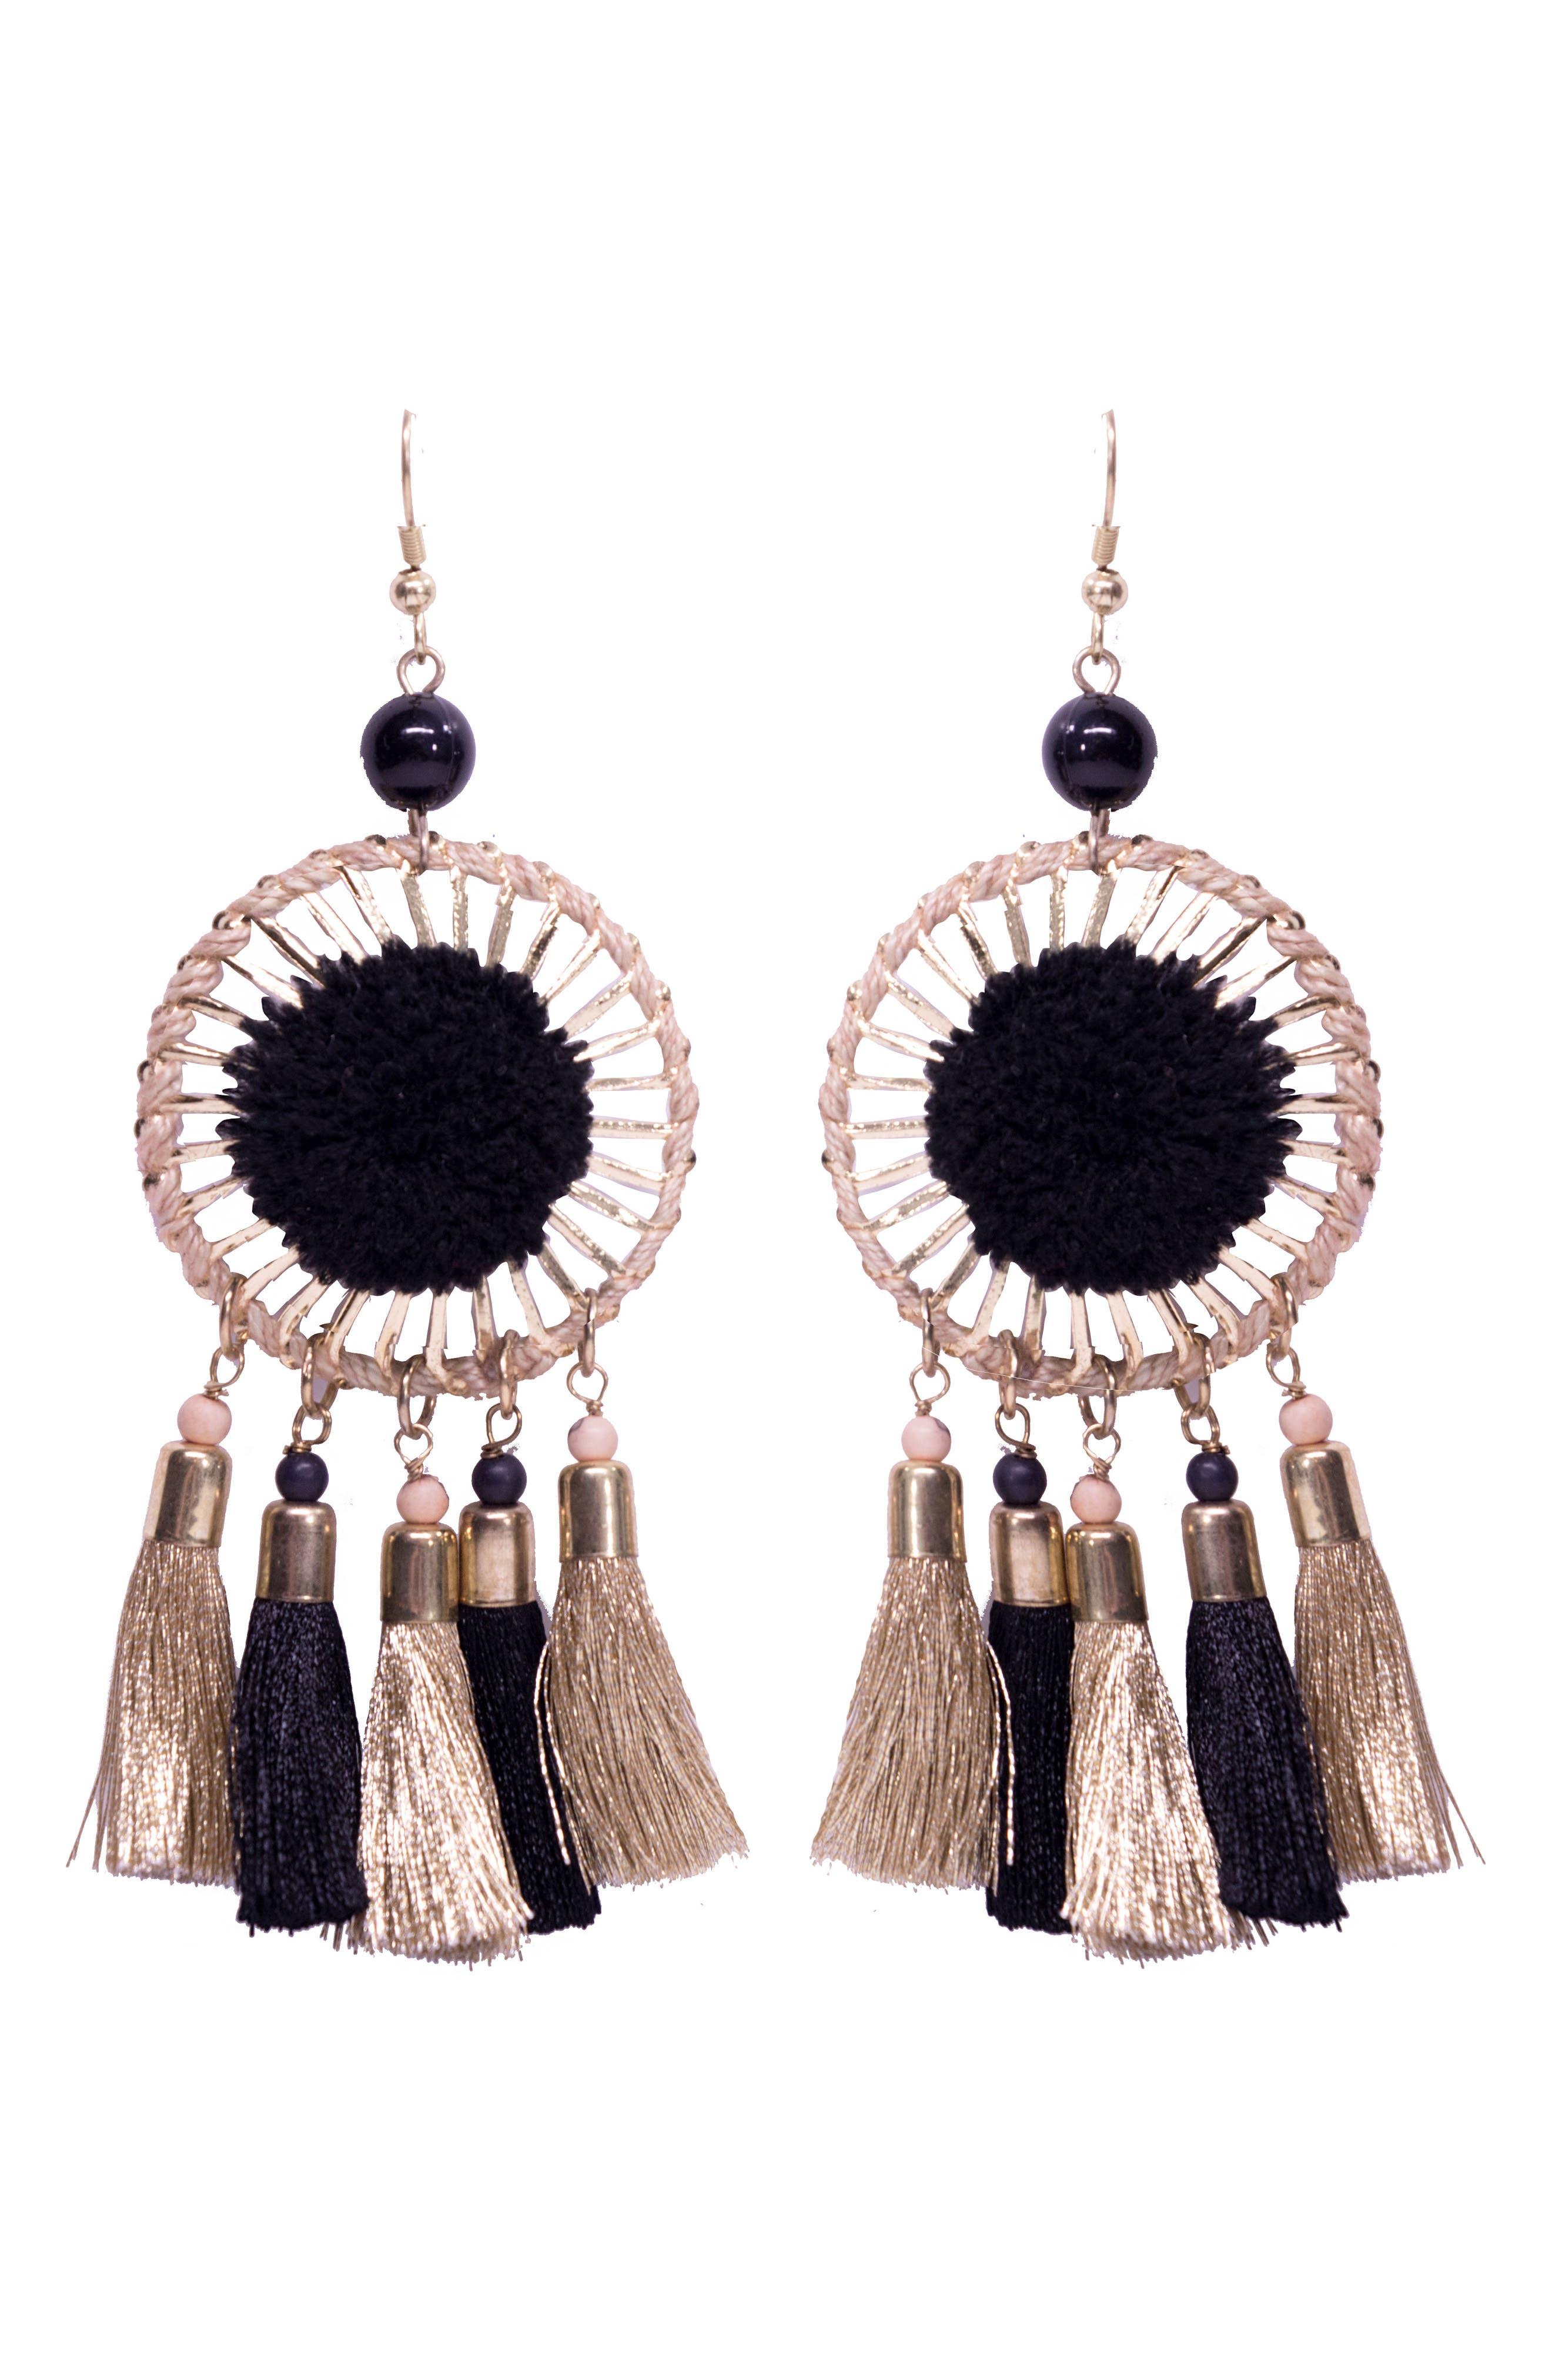 Nolita Statement Earrings,                             Main thumbnail 1, color,                             Gold/ Black